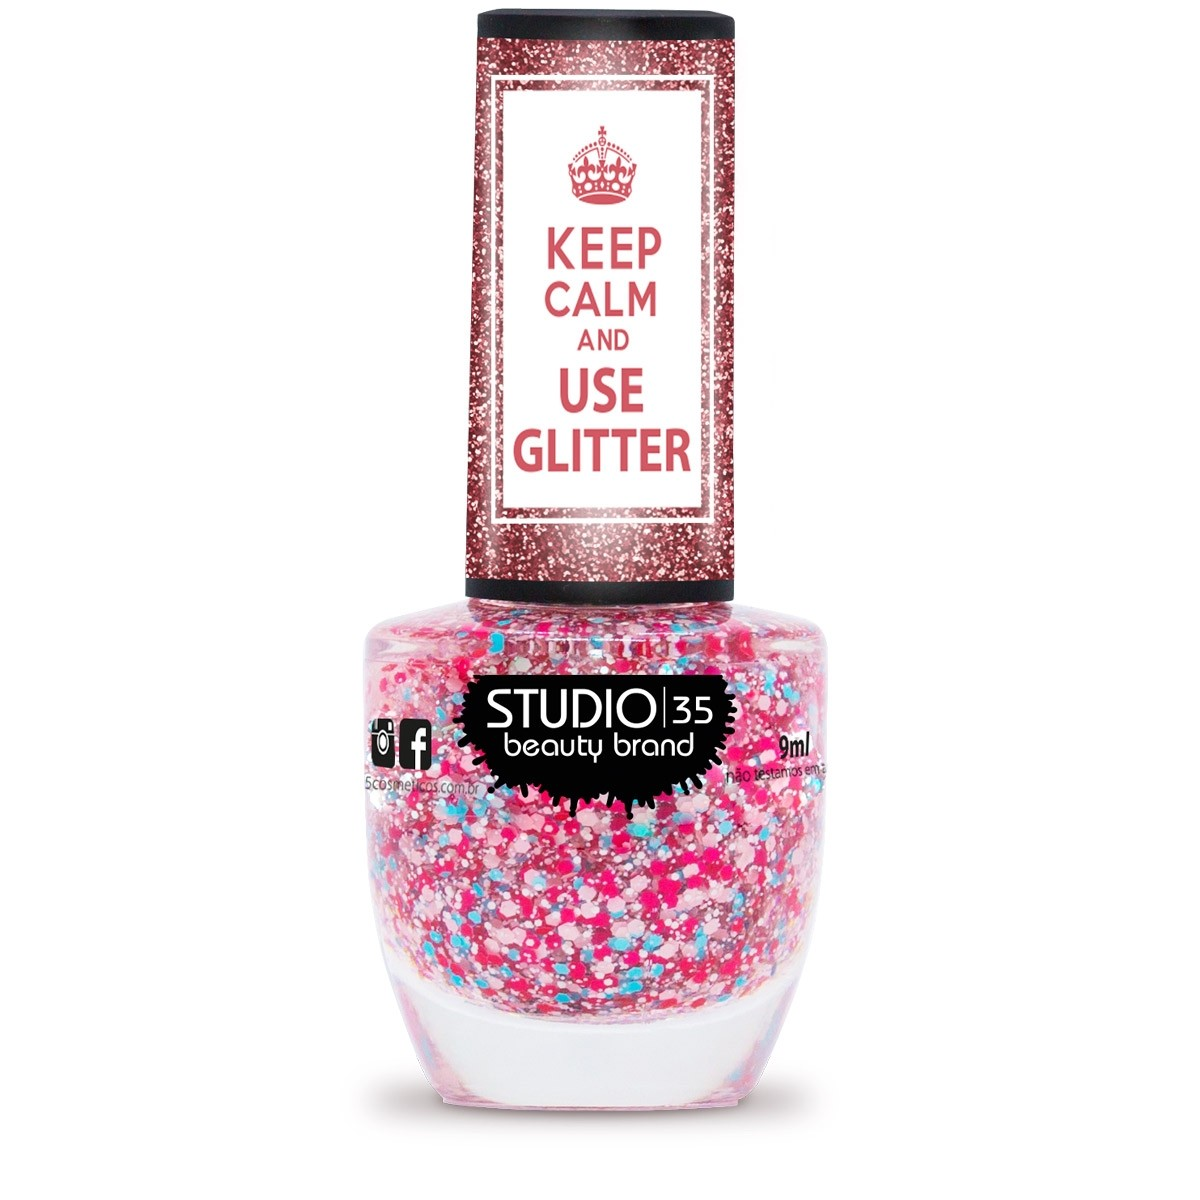 Esmalte Studio 35 #NinguemTemEsse Coleção Use Glitter